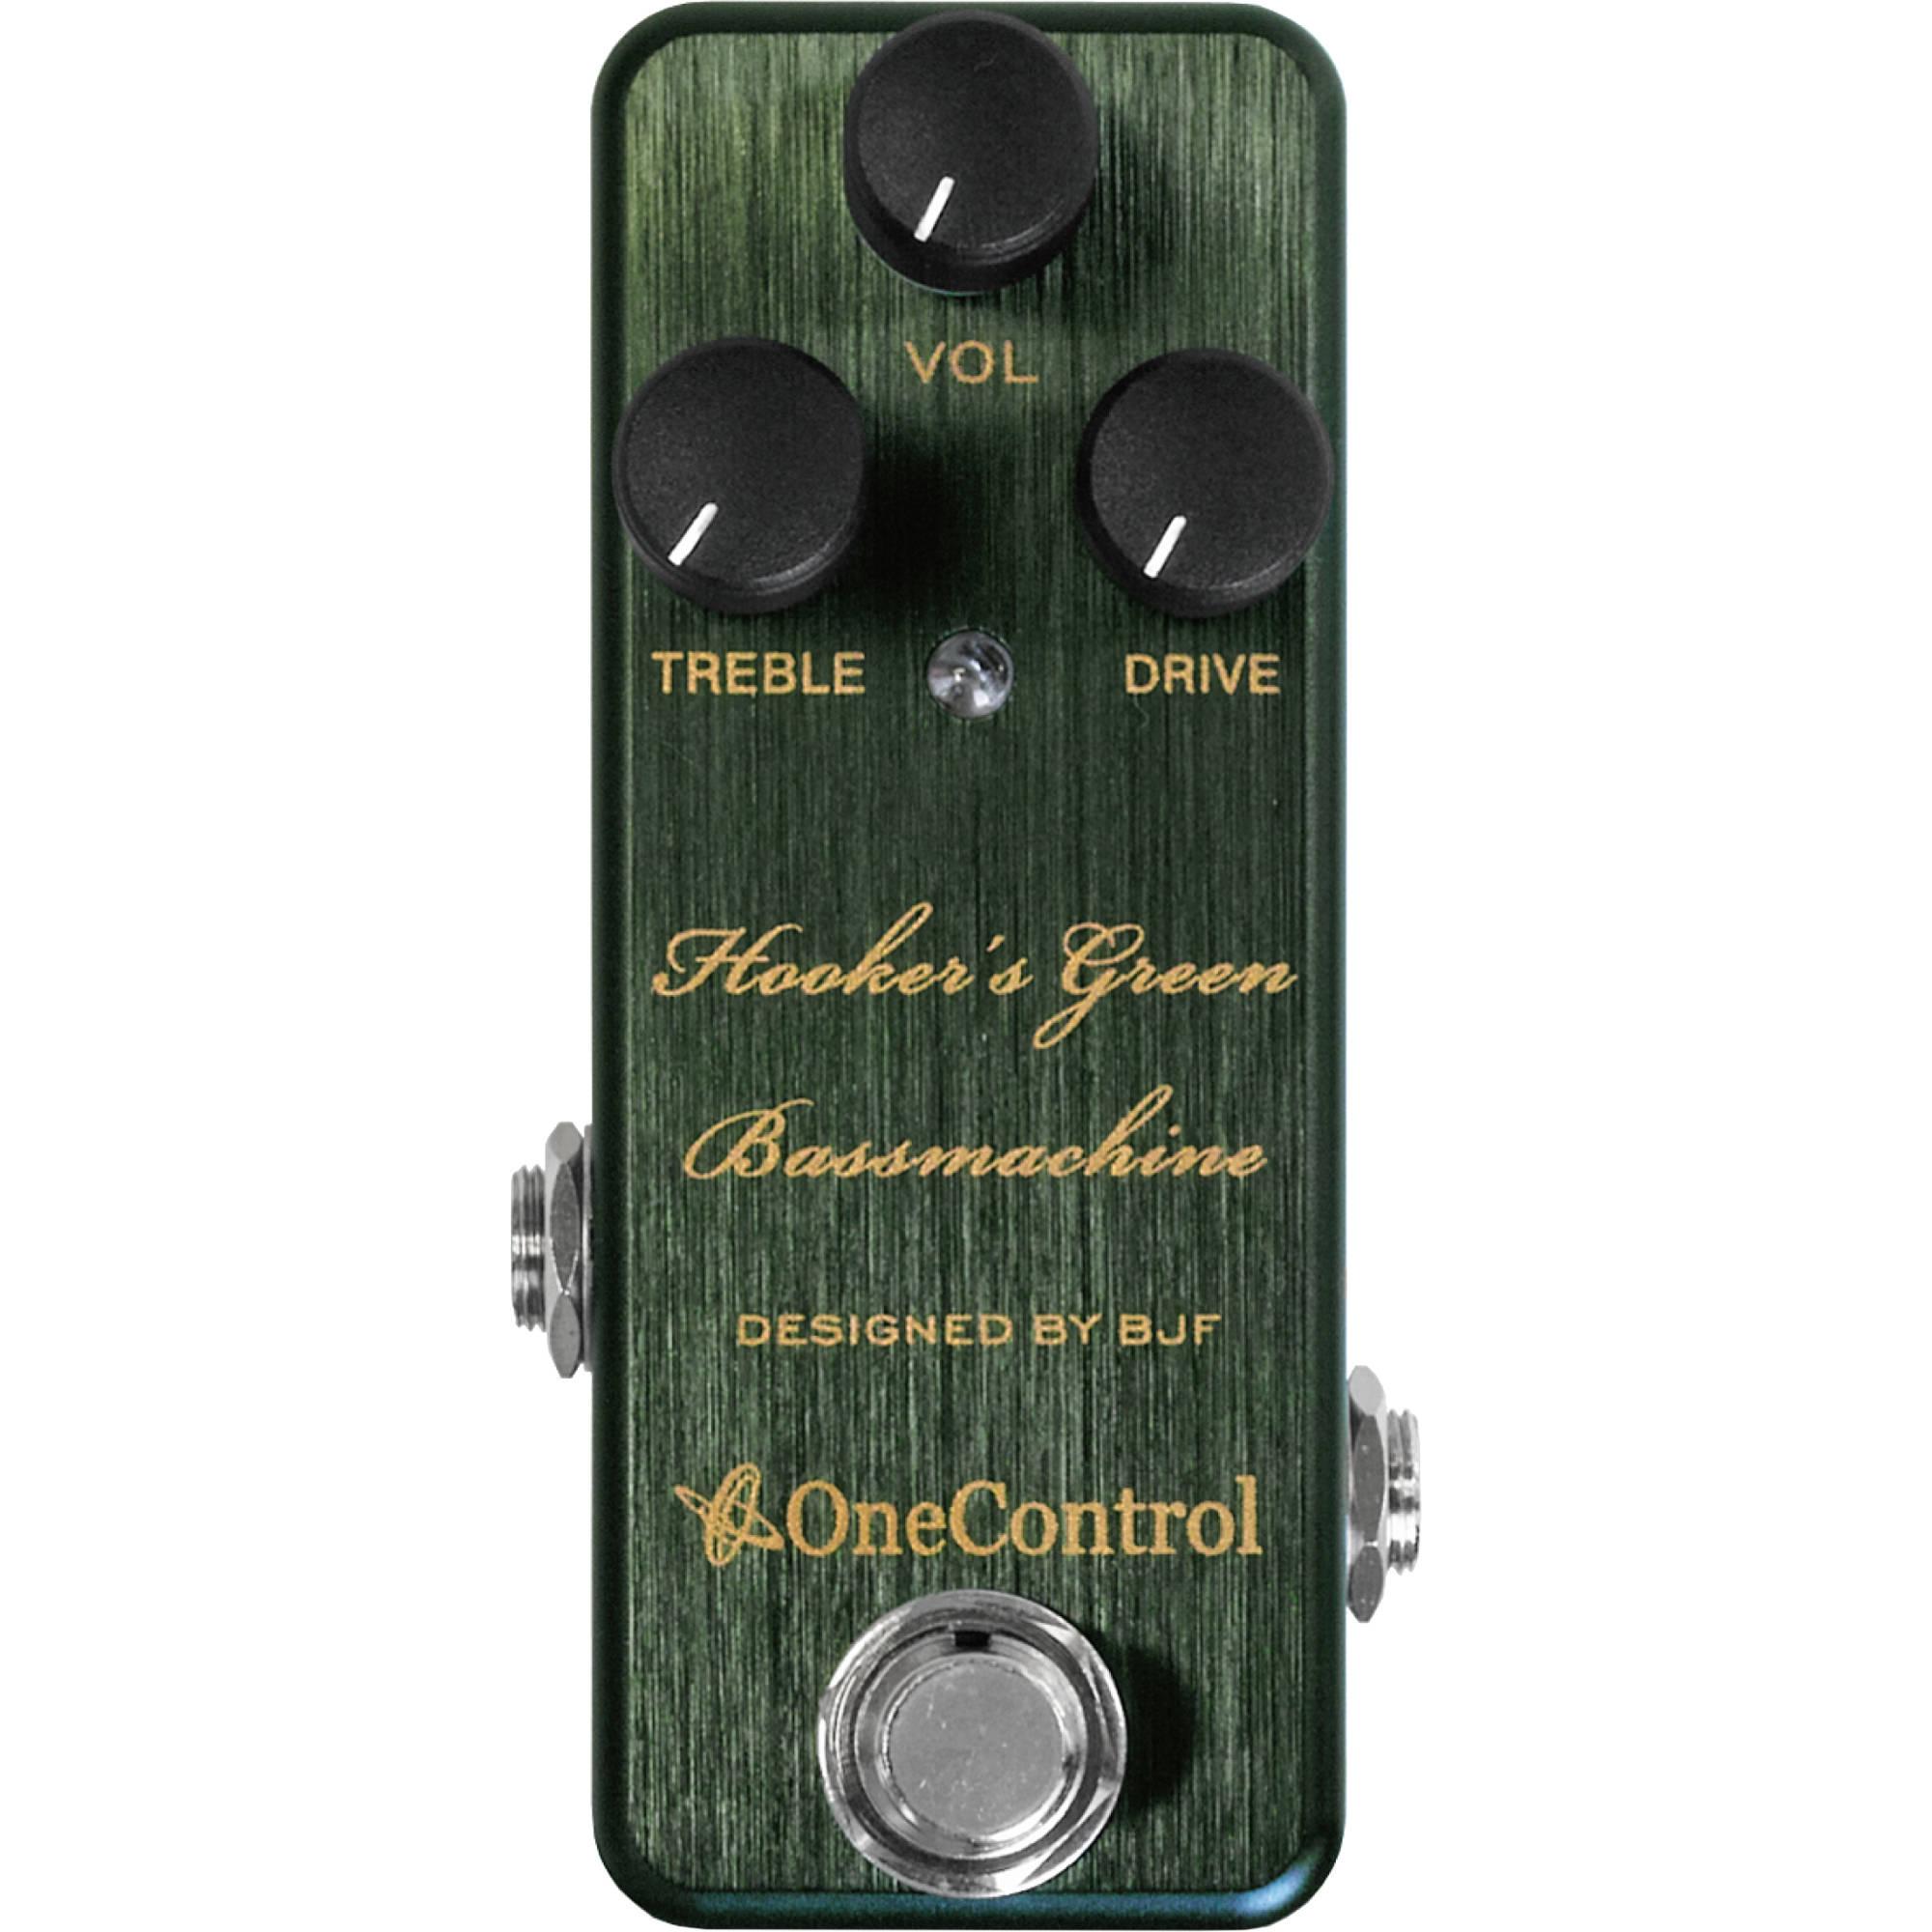 Https C Product 1125260 Reg Softlens Bc Rainbow 165mm Onecontrol Hookers Green Hooker S Bass Machine 1318589